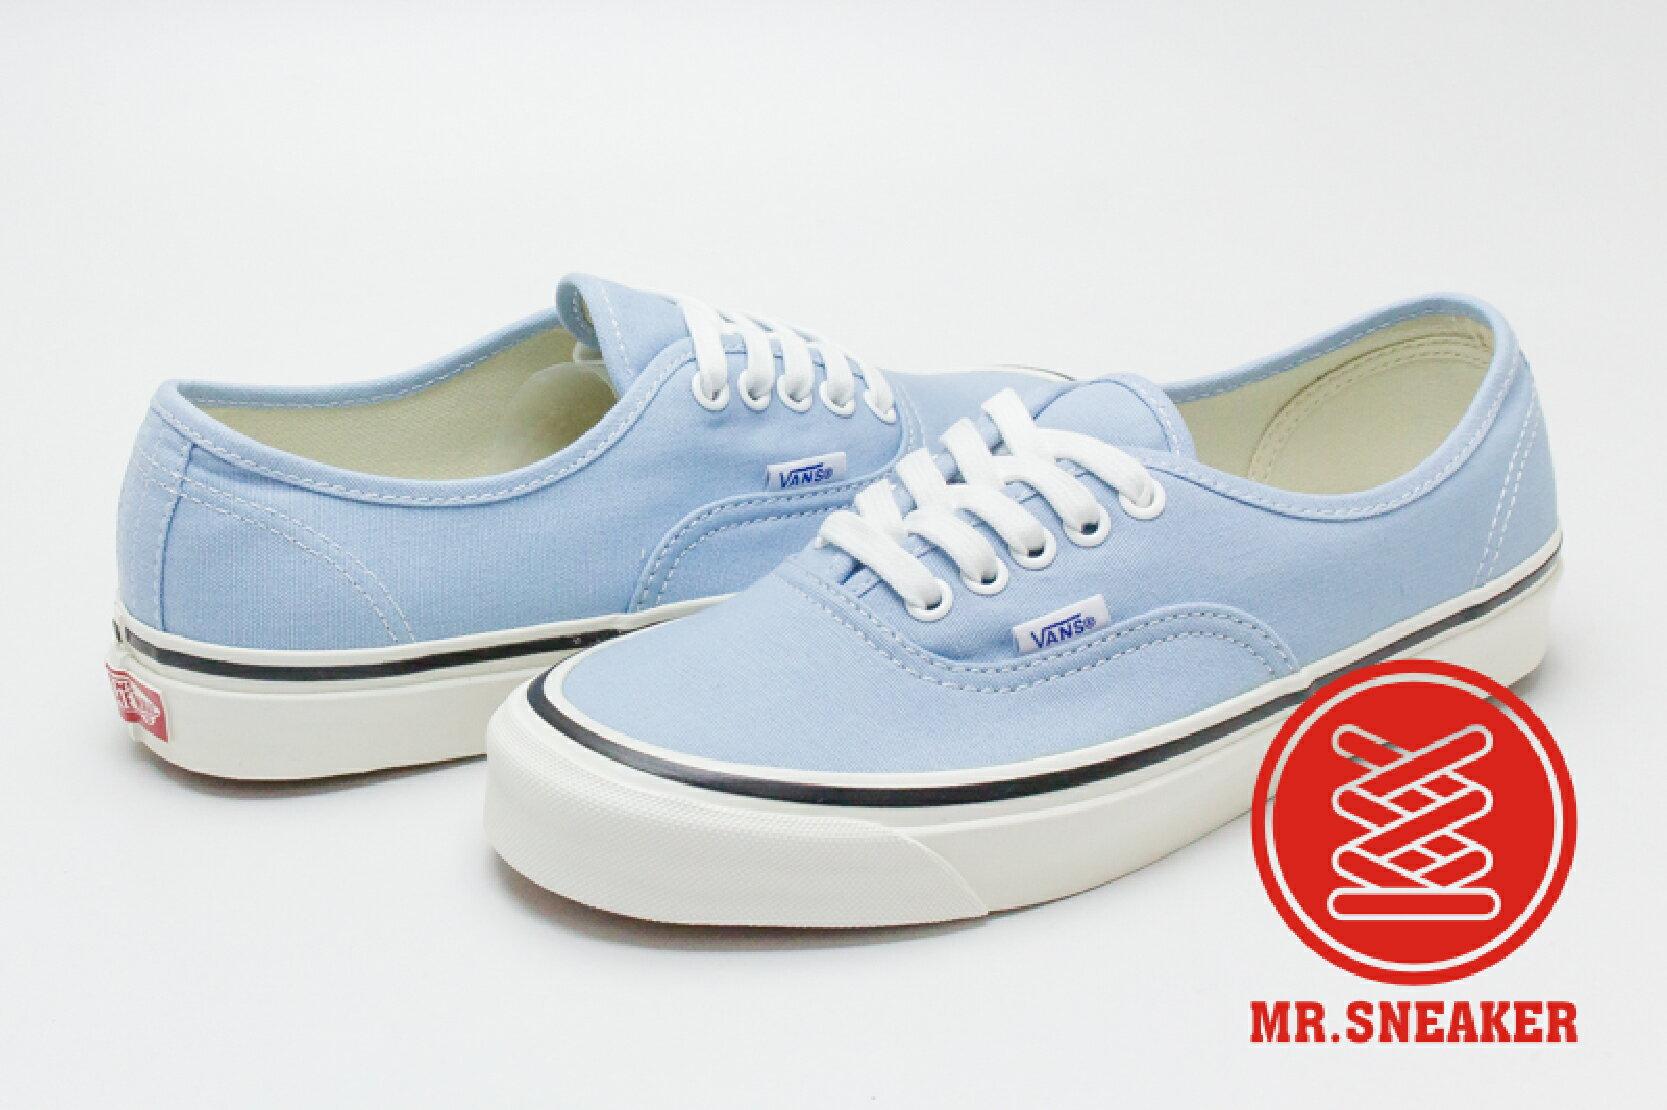 ☆Mr.Sneaker☆ VANS Anaheim Factory Authentic 44 DX 淺藍 女段